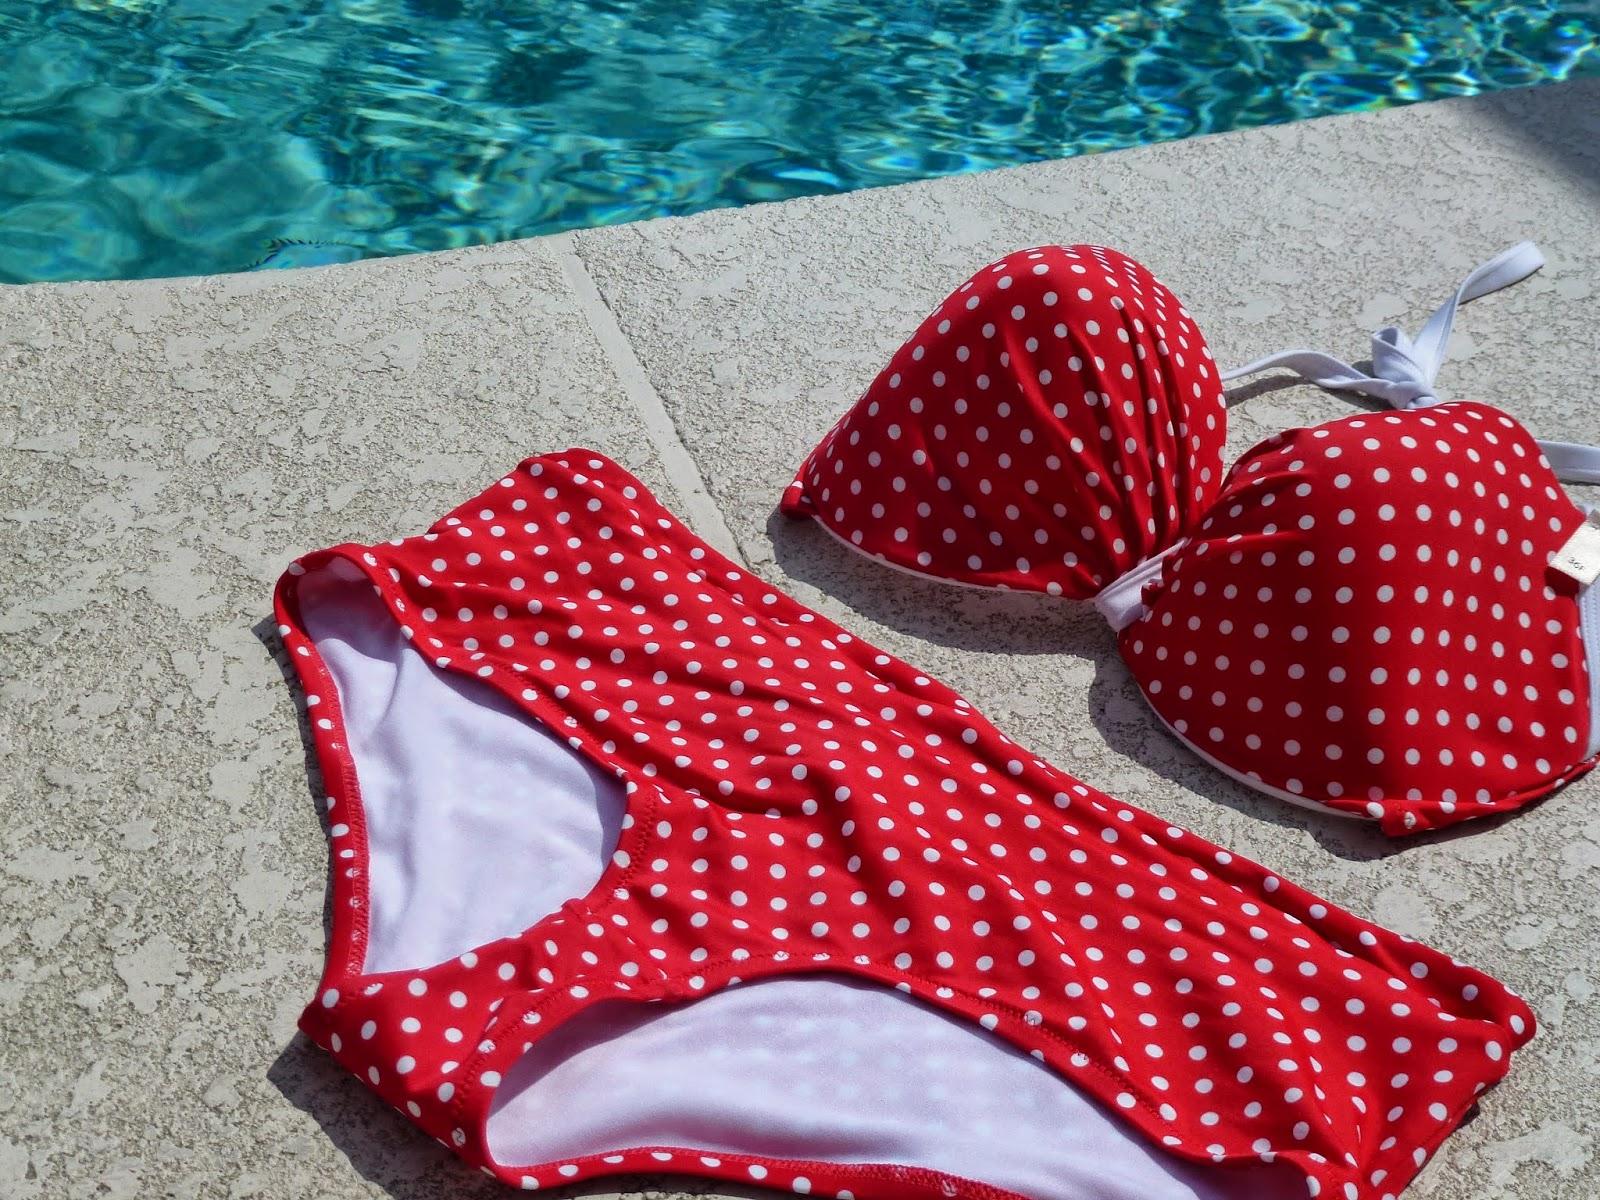 red-polka-dot-bikini